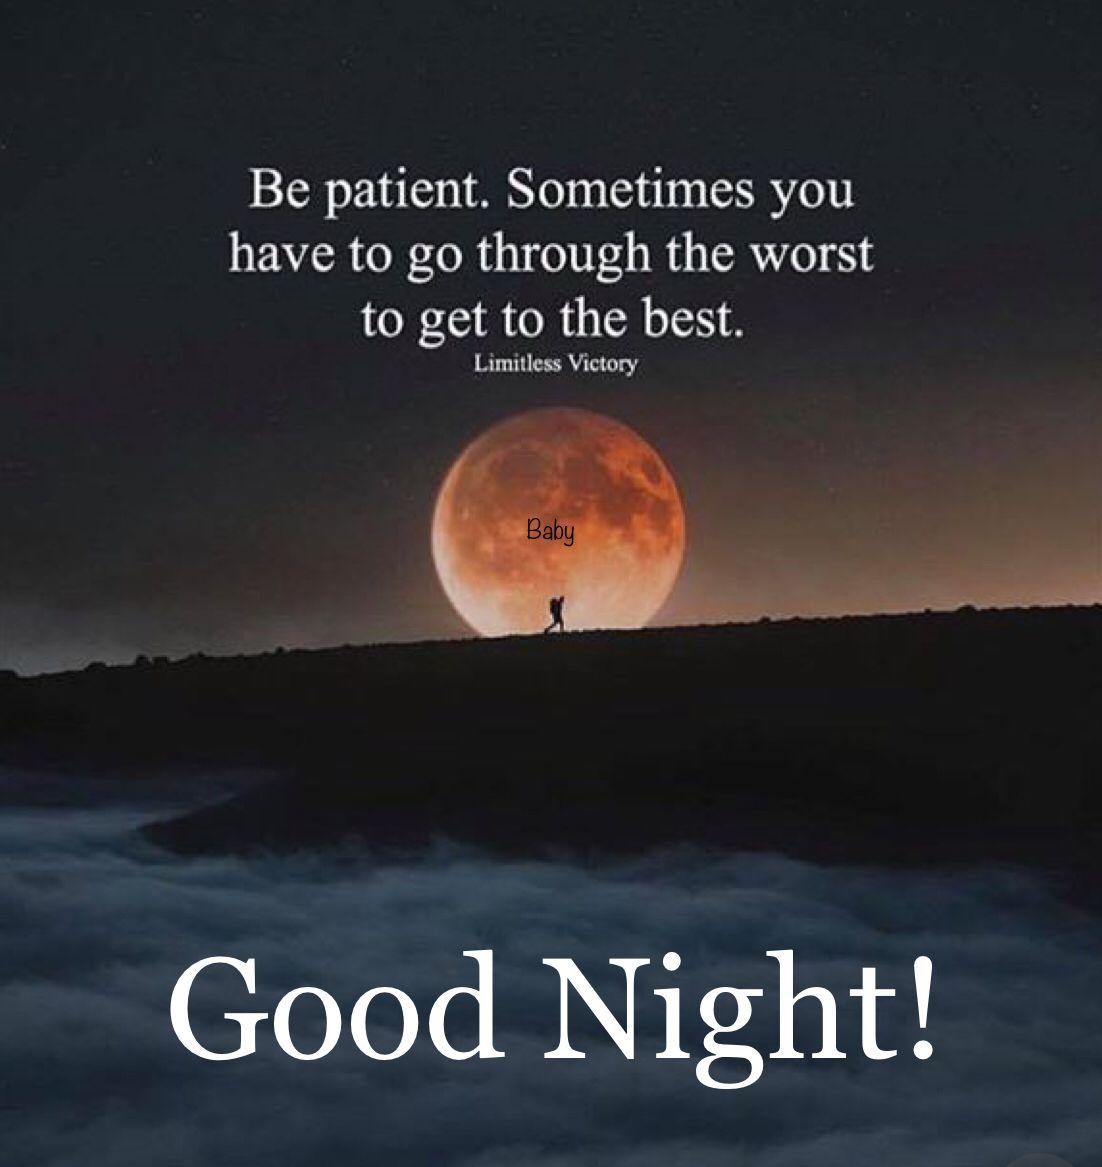 Good Night!   Good night prayer, Night prayer, Bible quotes